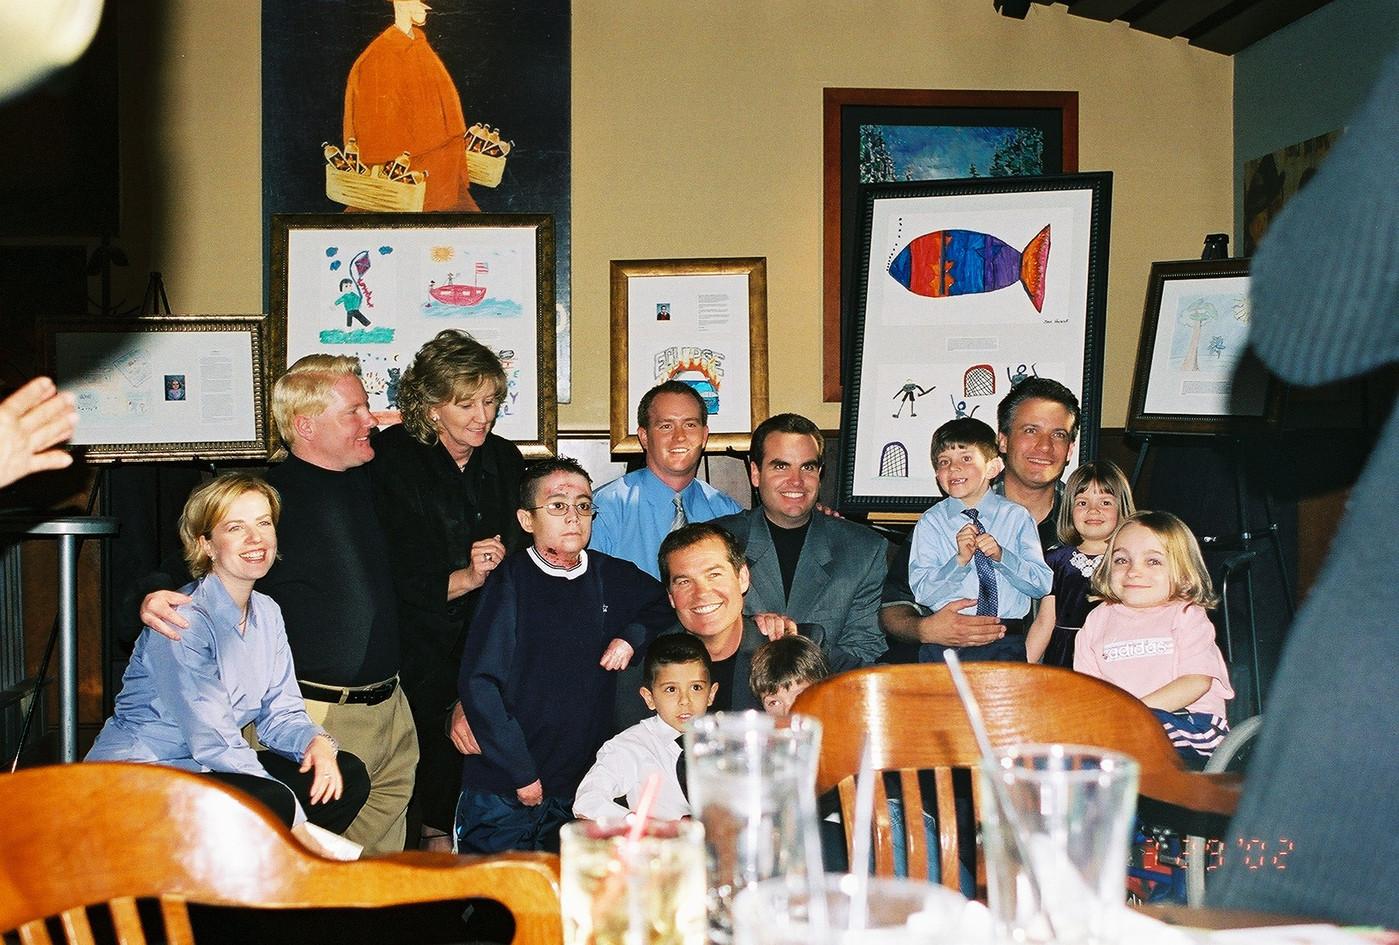 Bob Goen E.T. Wish Kids.charity